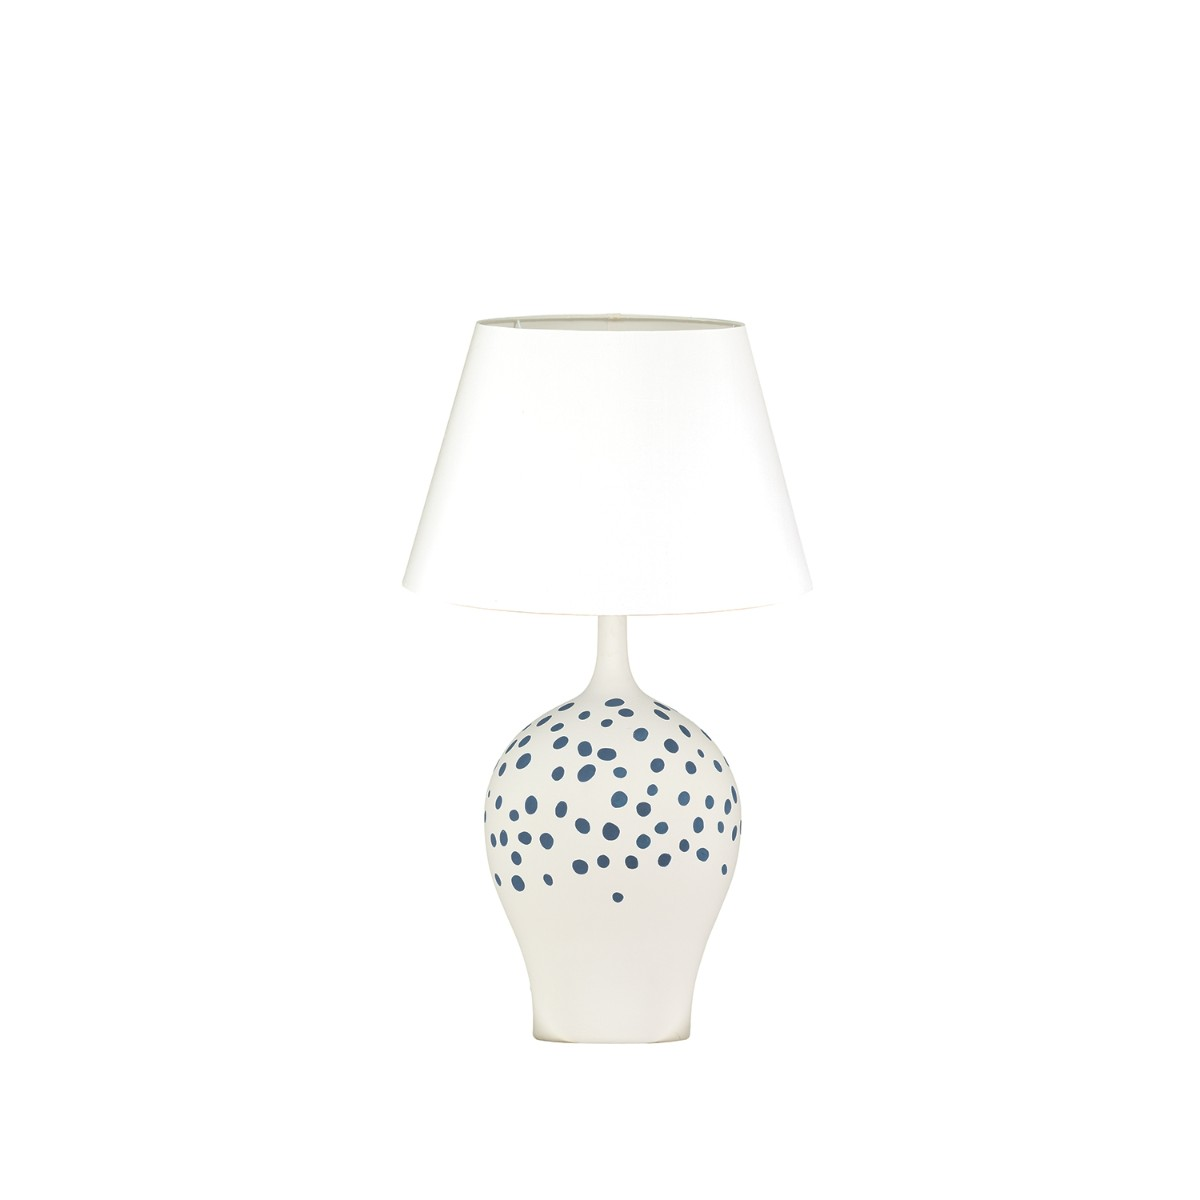 William Yeoward | Angelica Table Lamp | Indigo